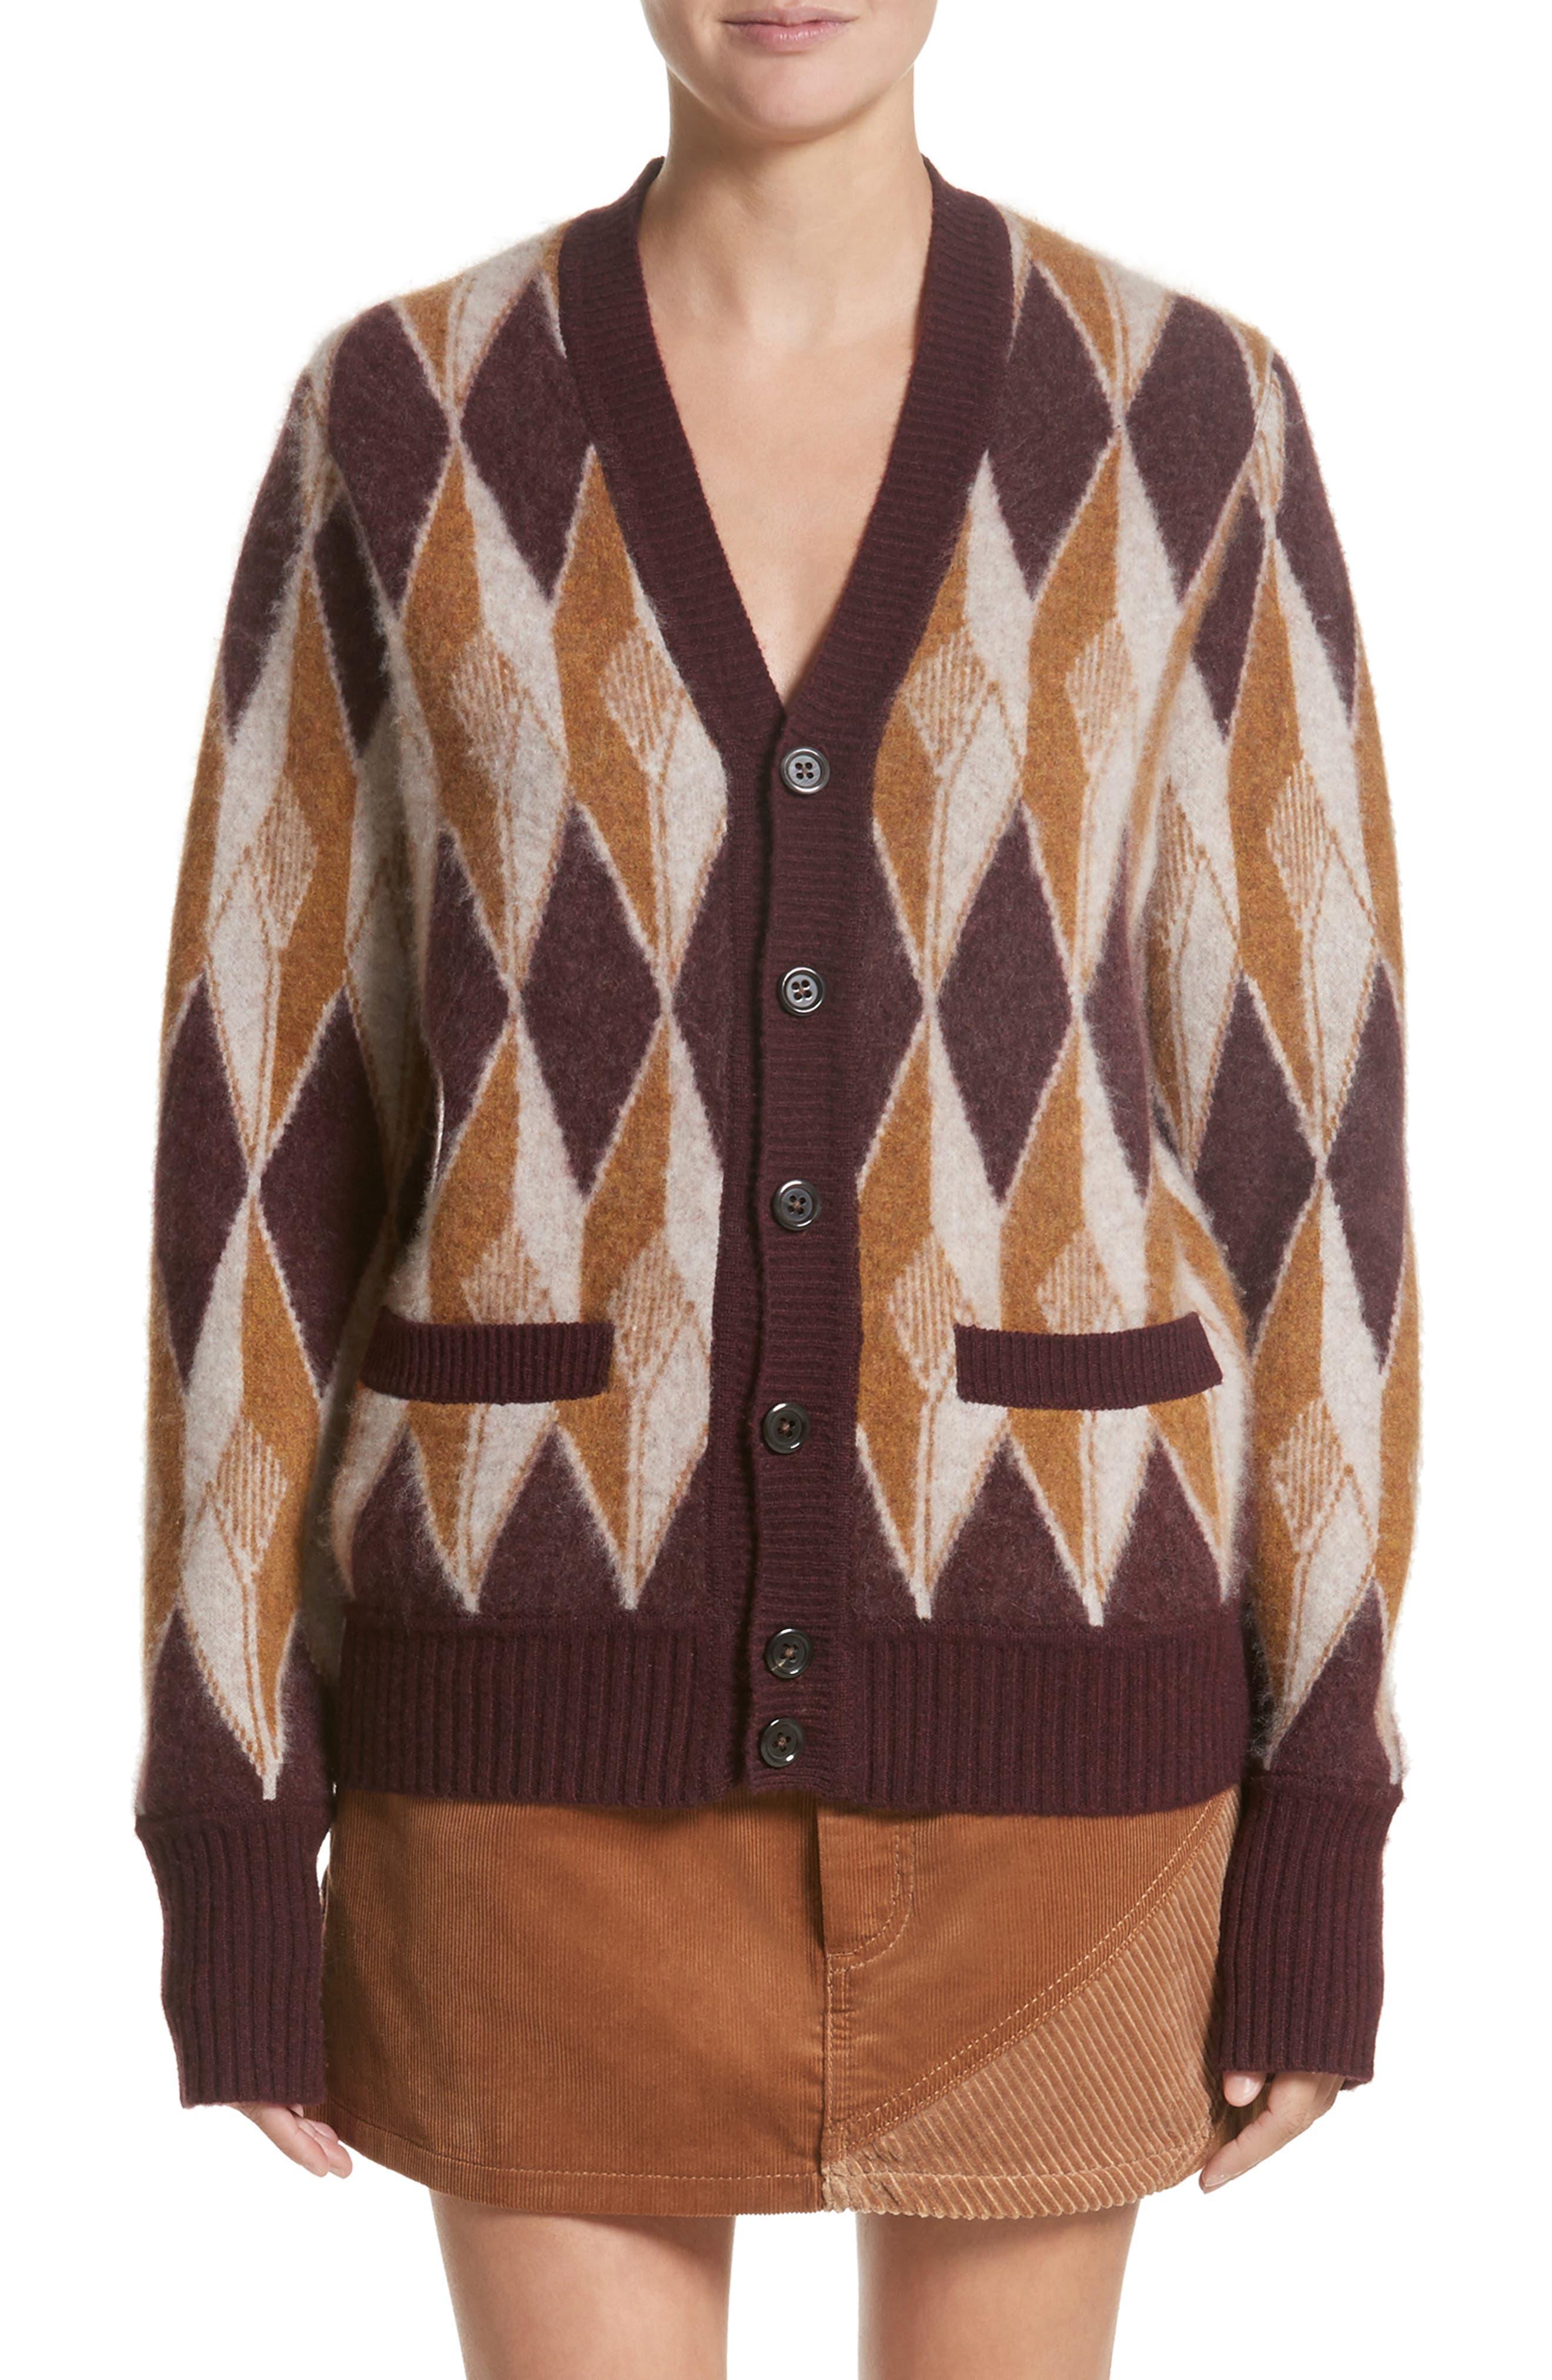 MARC JACOBS Boiled Cashmere Jacquard Button Cardigan